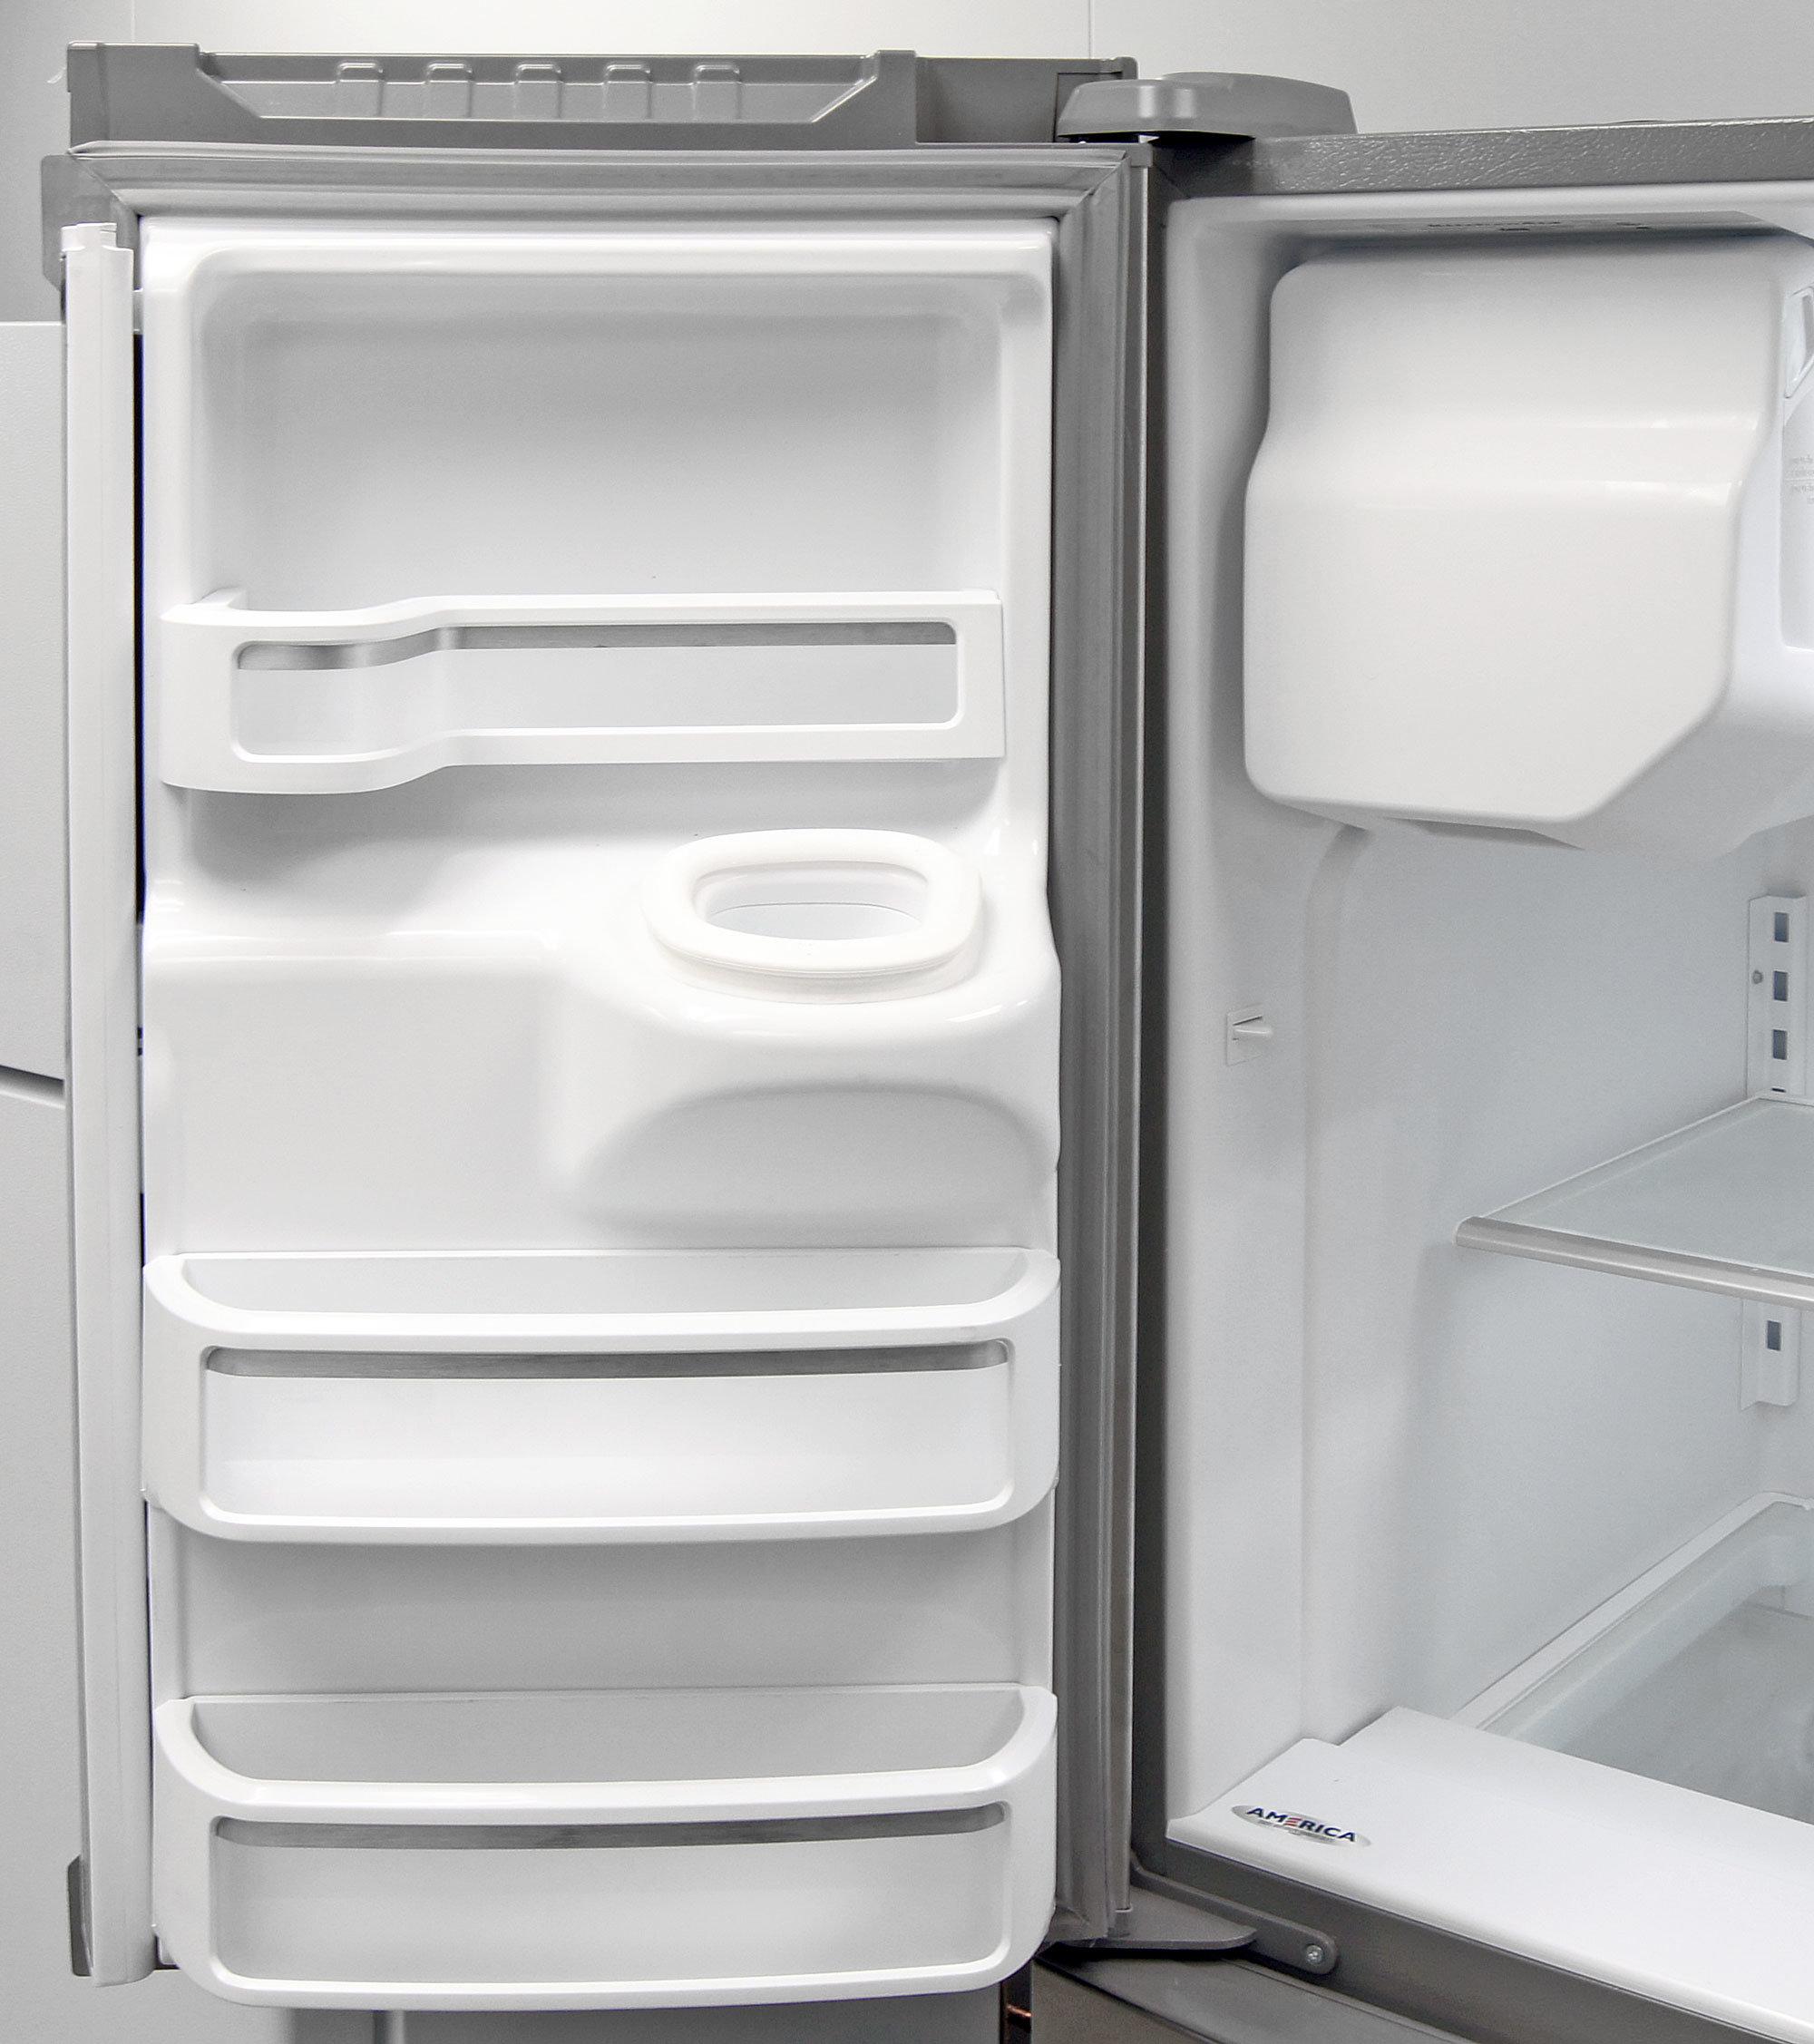 Storage on the left fridge door is distorted to accommodate the KitchenAid KFXS25RYMS's ice dispenser chute.